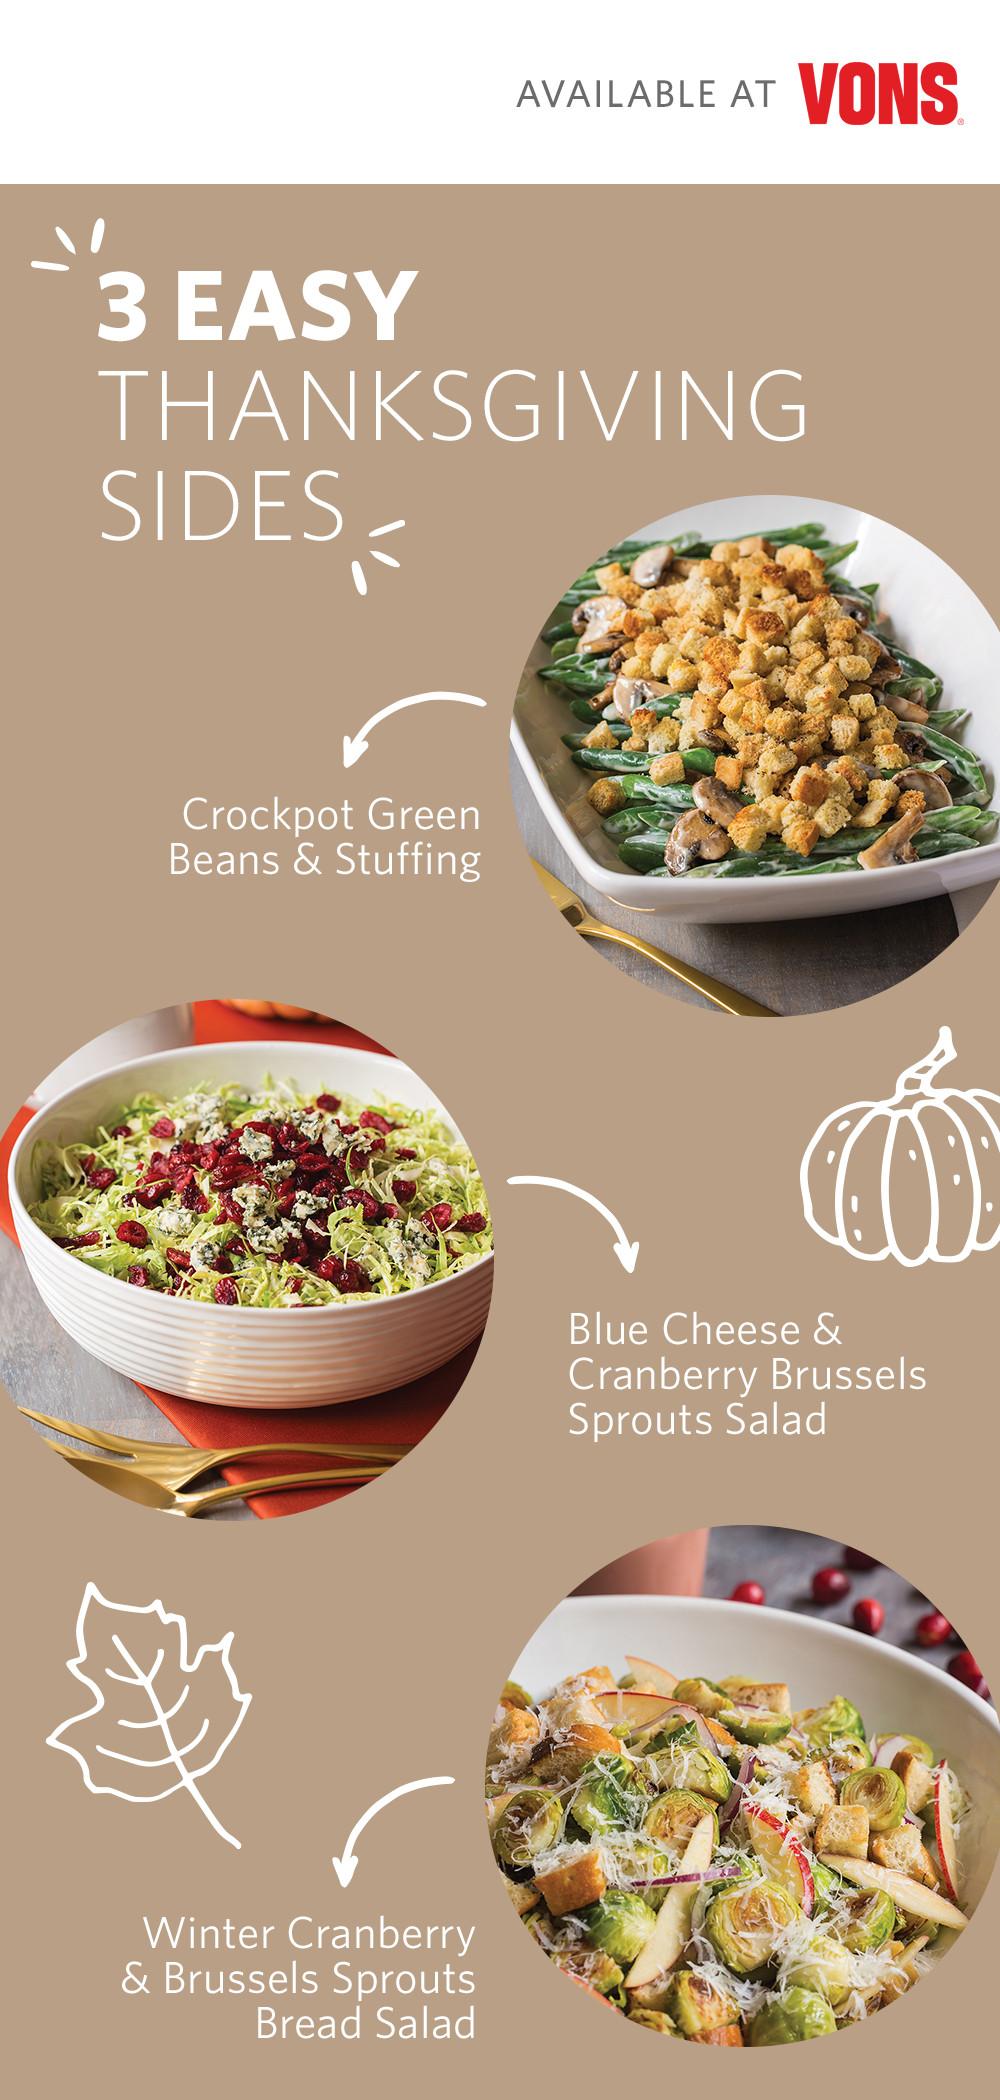 Albertsons Thanksgiving Dinner  Vons Thanksgiving Deals